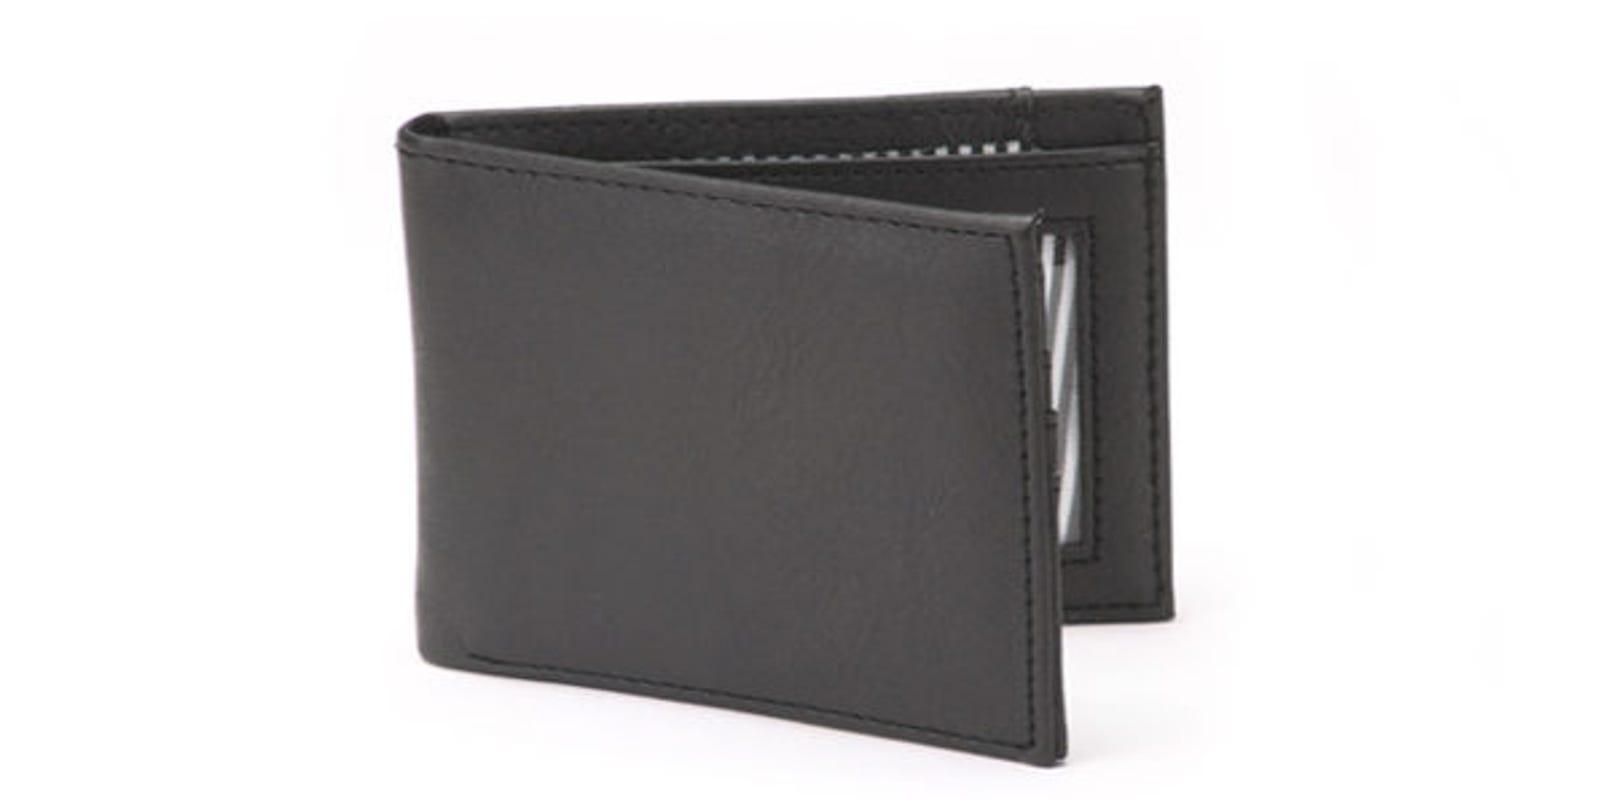 Is an RFID-blocking wallet necessary?